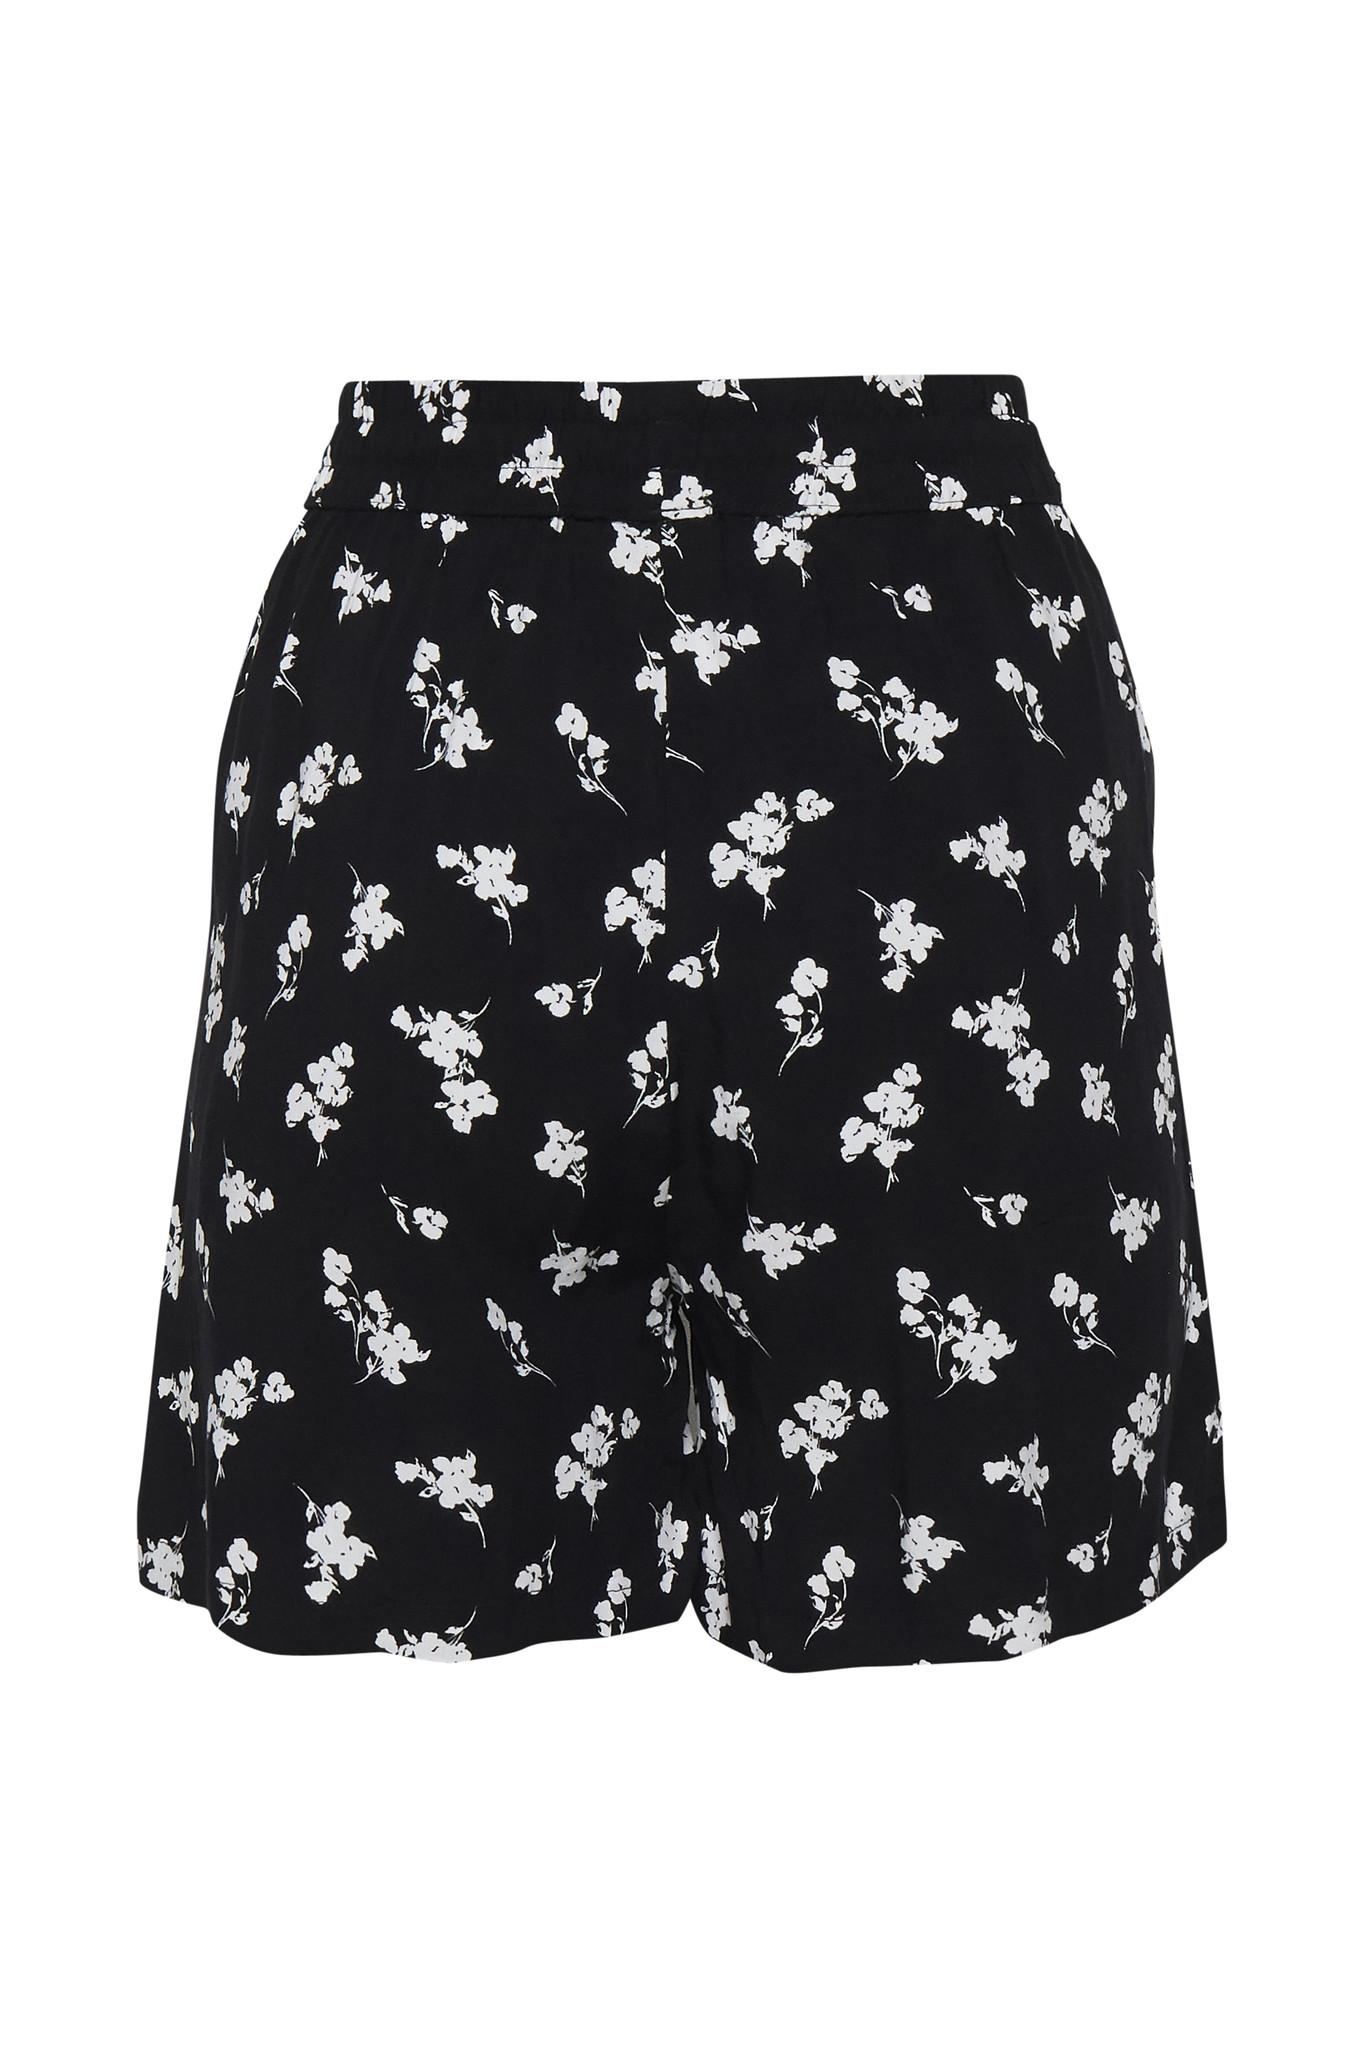 byisole shorts black combi 5-3